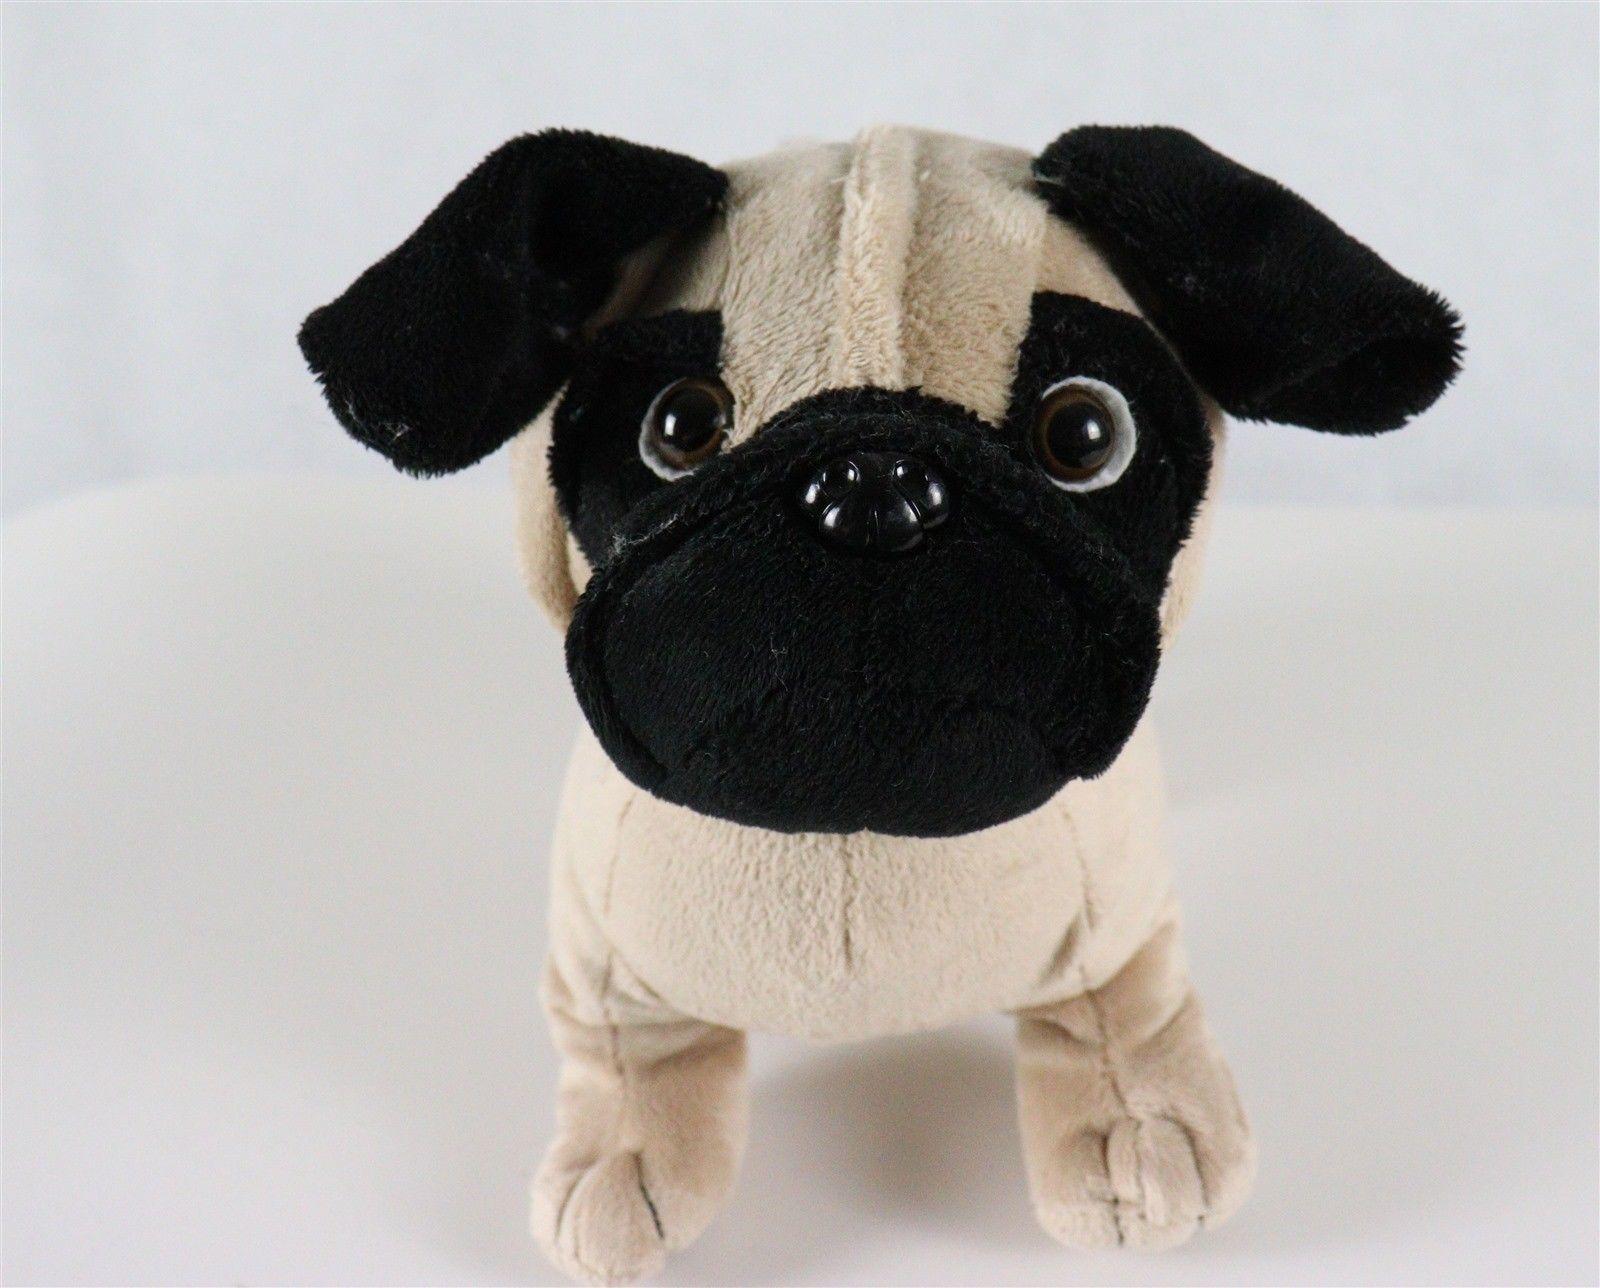 Woof Street Pug Dog Stuffed Plush